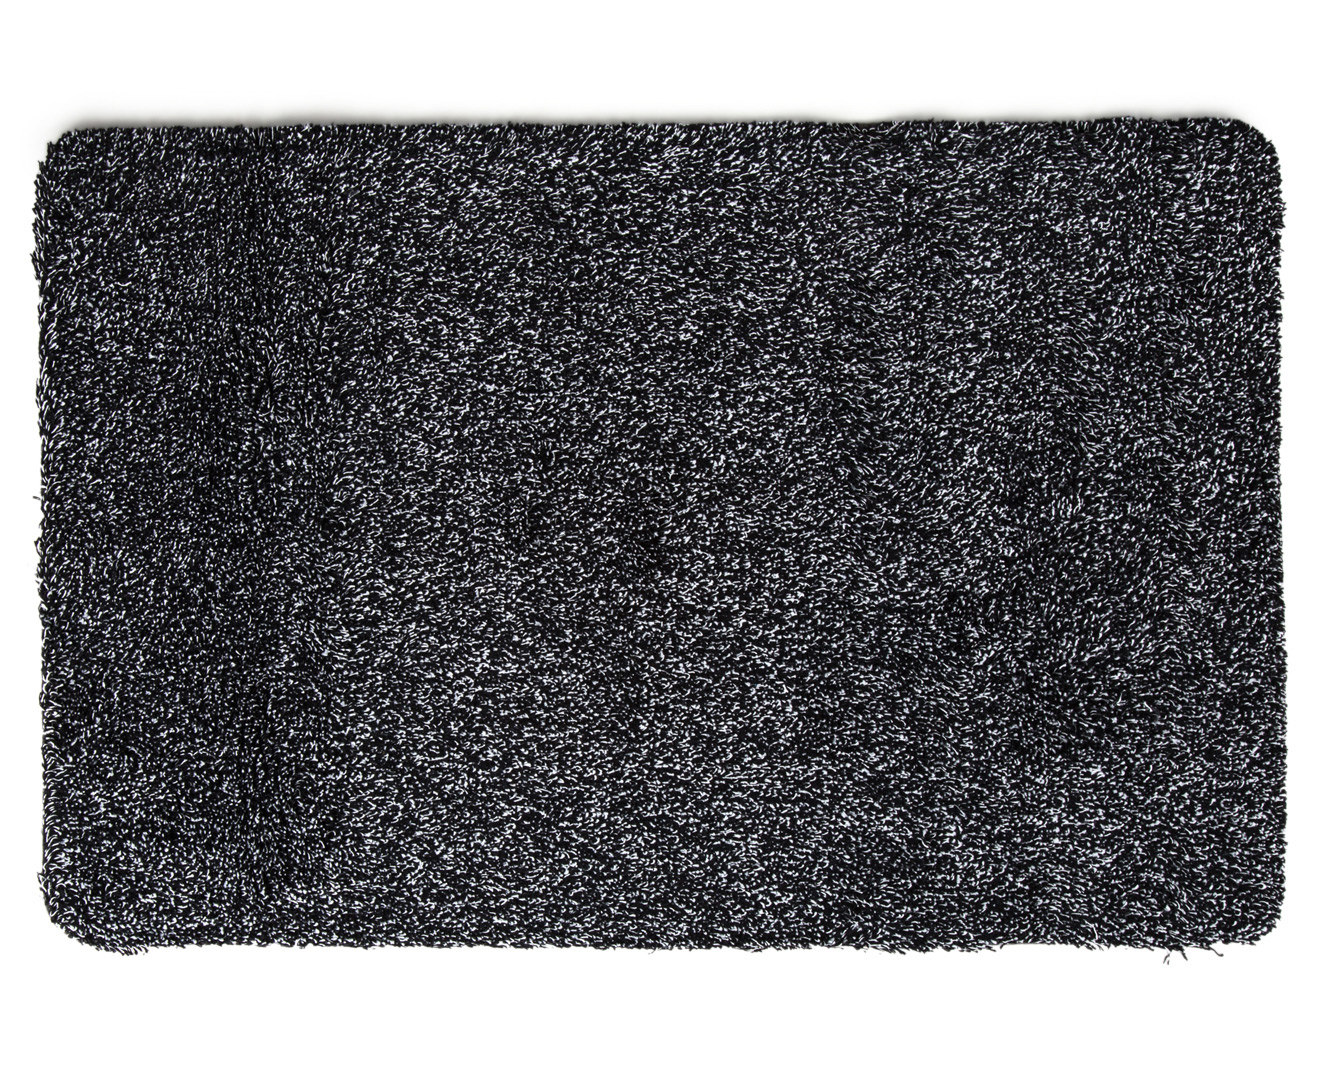 Gillter Red High Heels Show Non-Slip Home Decor Bathroom Carpet Door Mat Rug